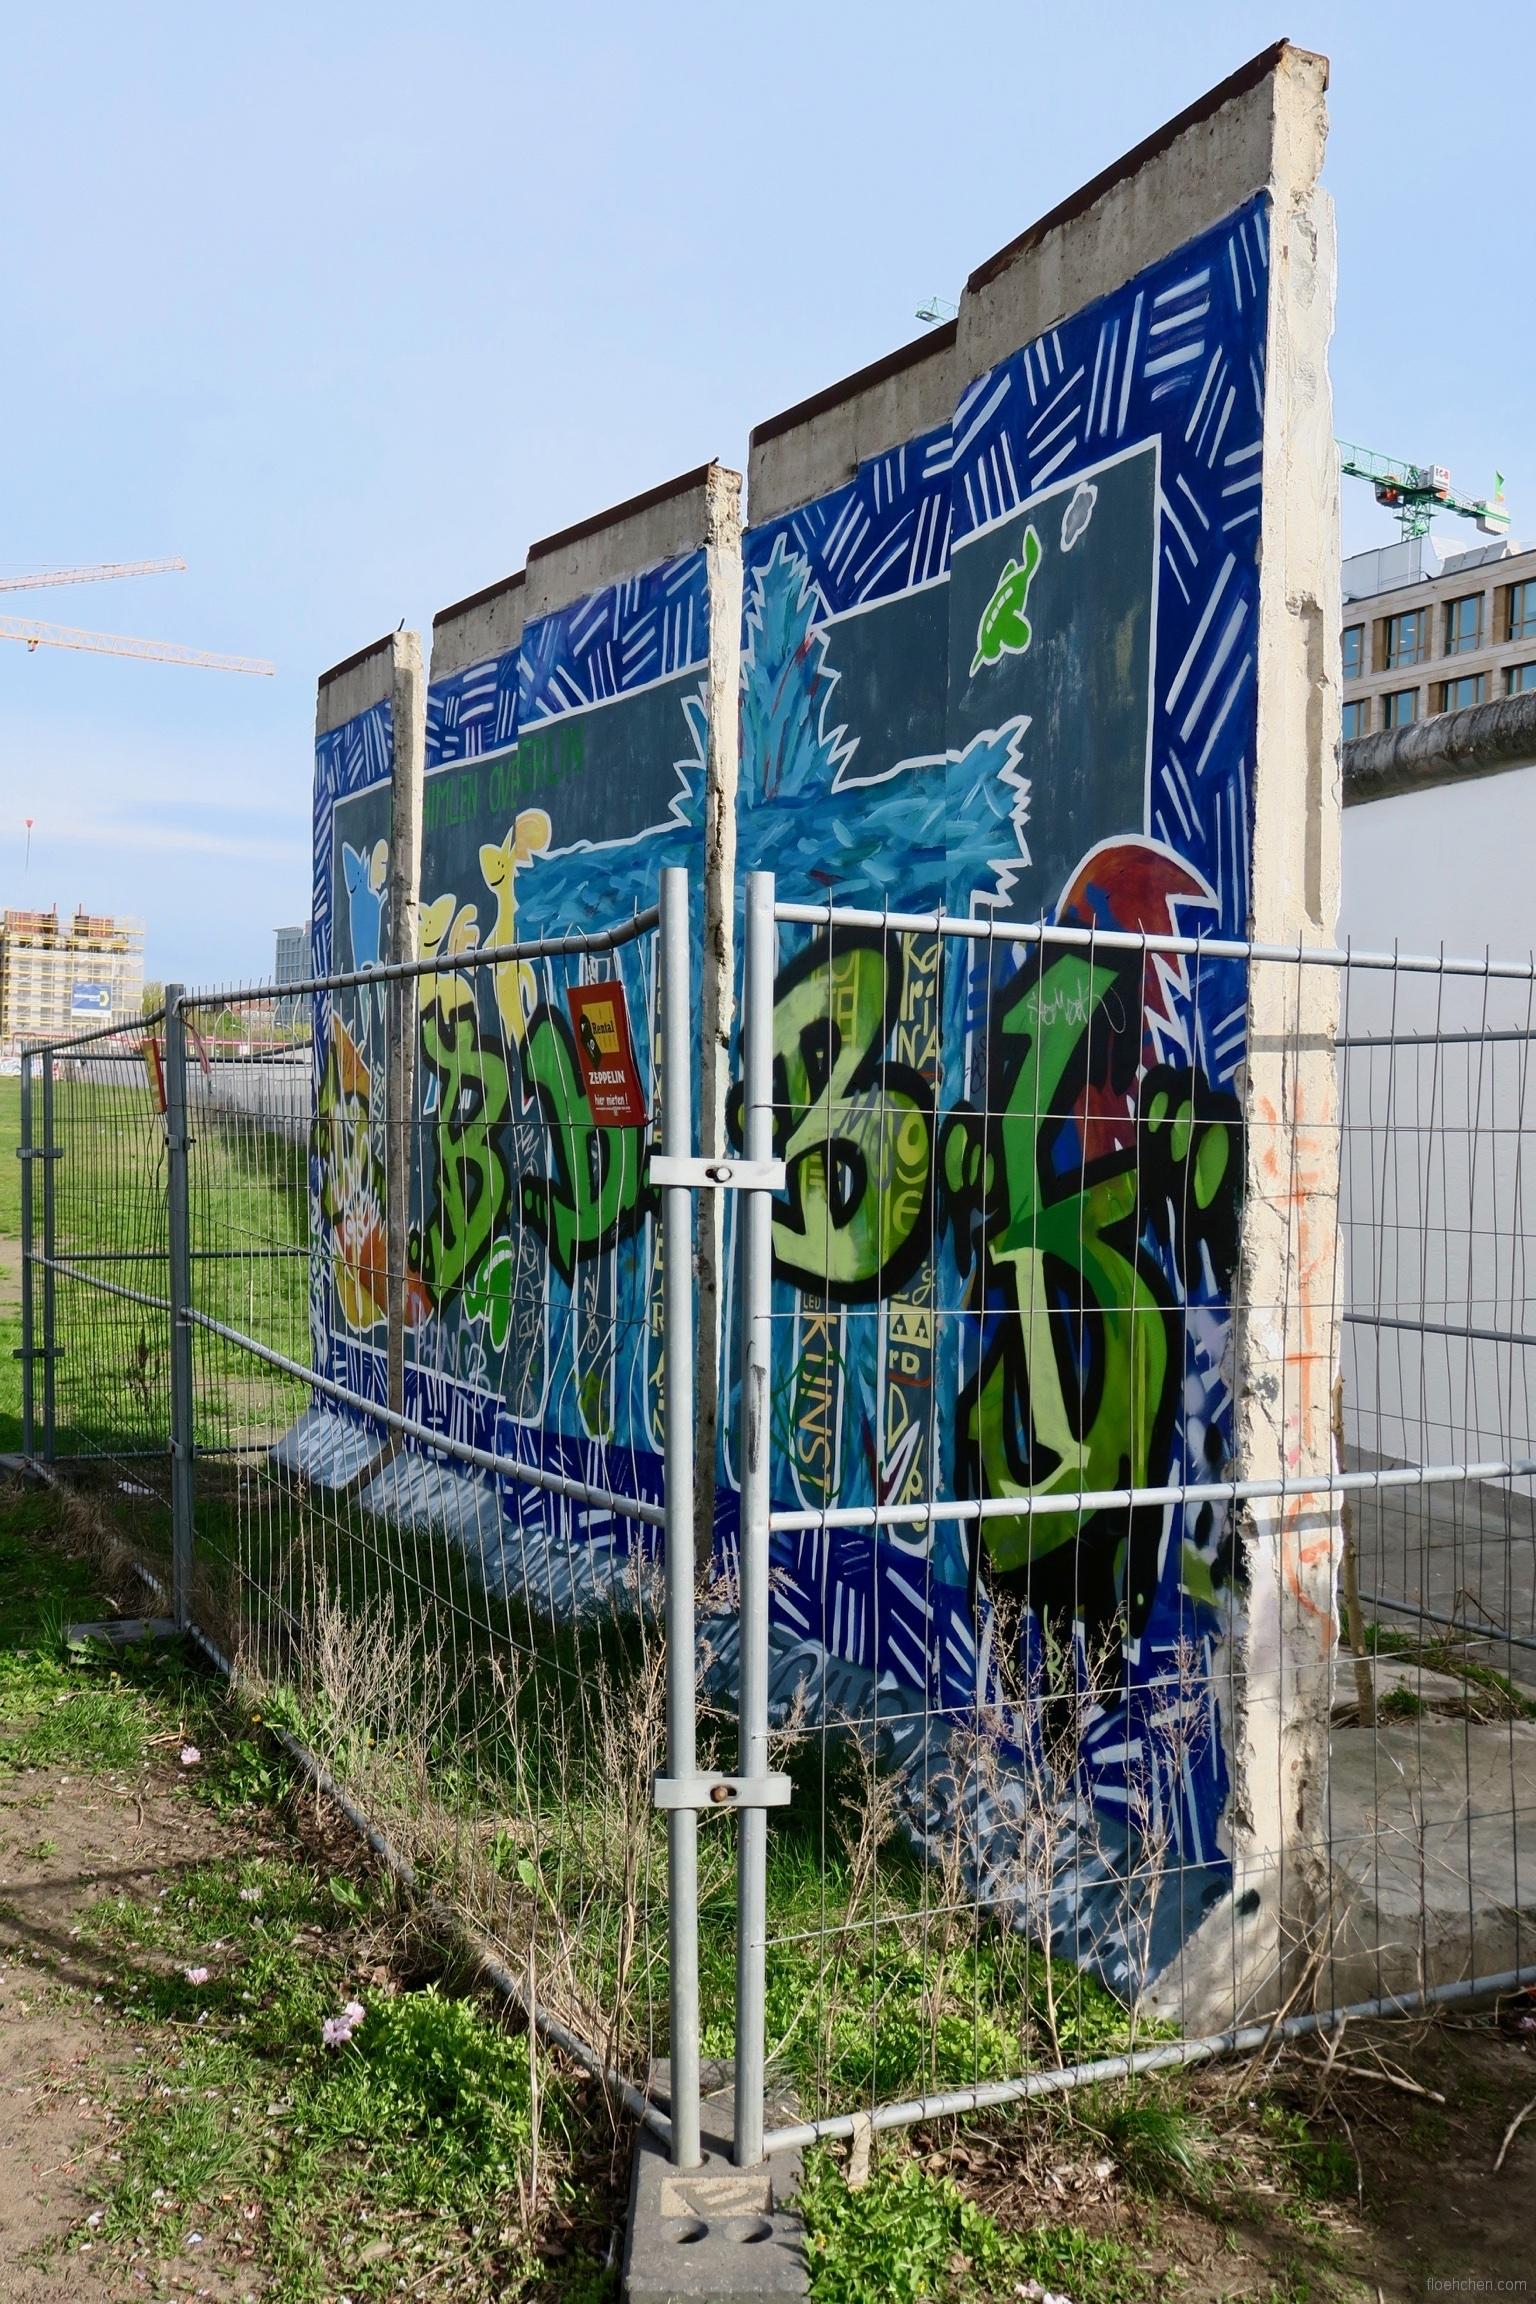 Berlin, April 2017 (Canon G3X)